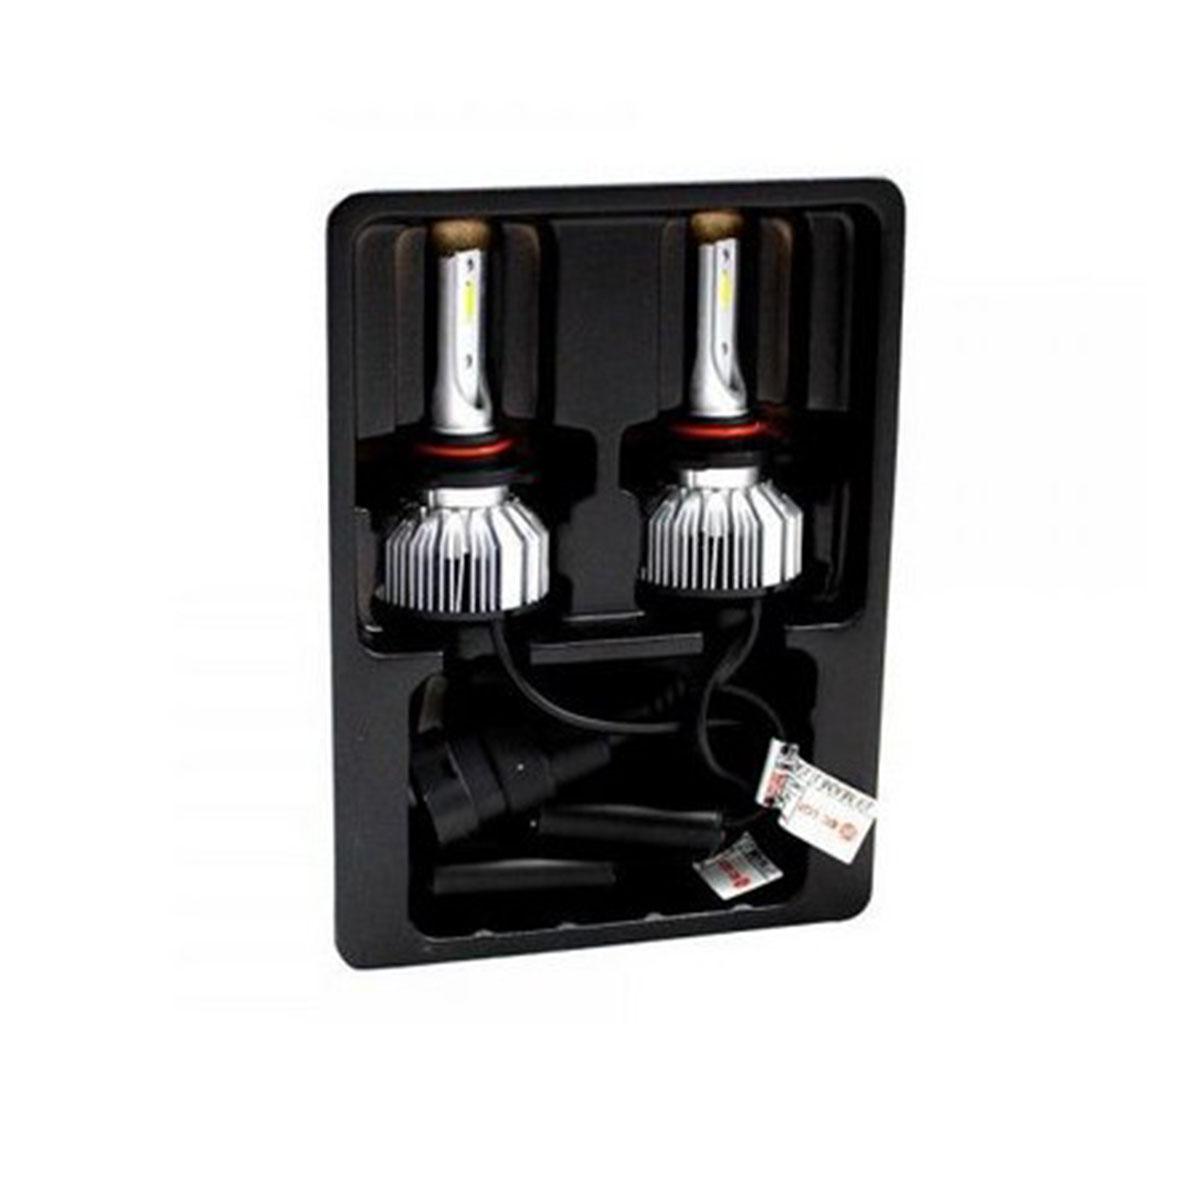 Lâmpada Headlight Led CC-LOT Compass H16 6000K